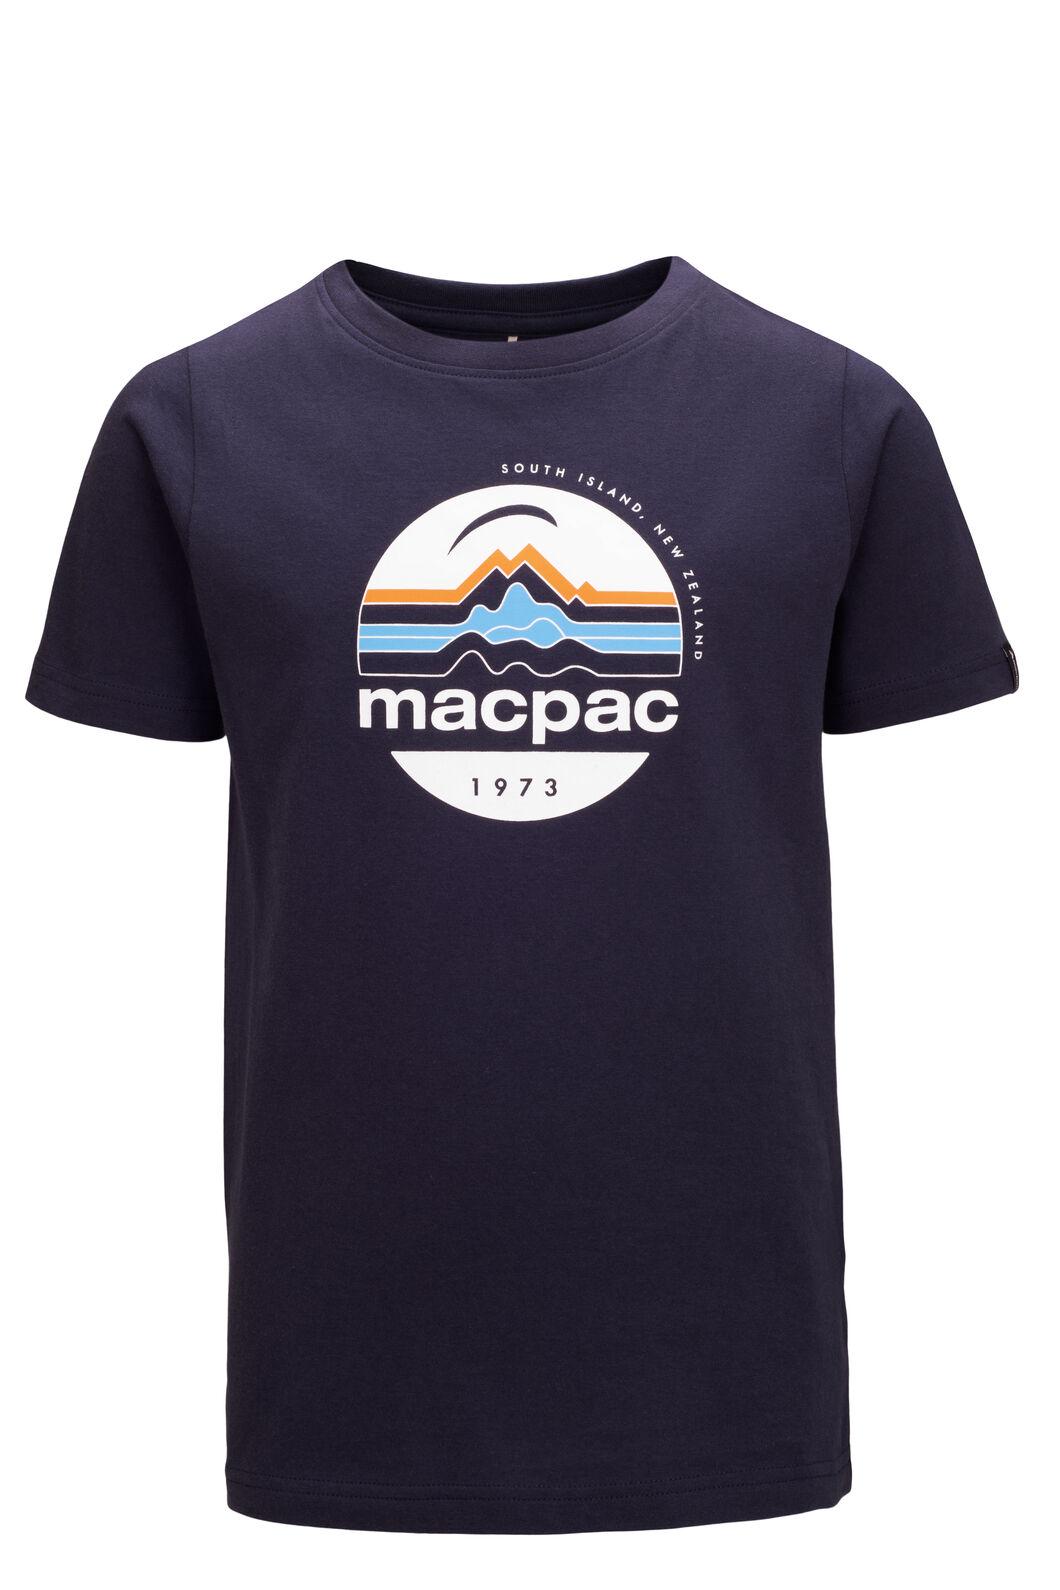 Macpac Retro Fairtrade Organic Cotton Tee — Kids', BLUE NIGHTS, hi-res